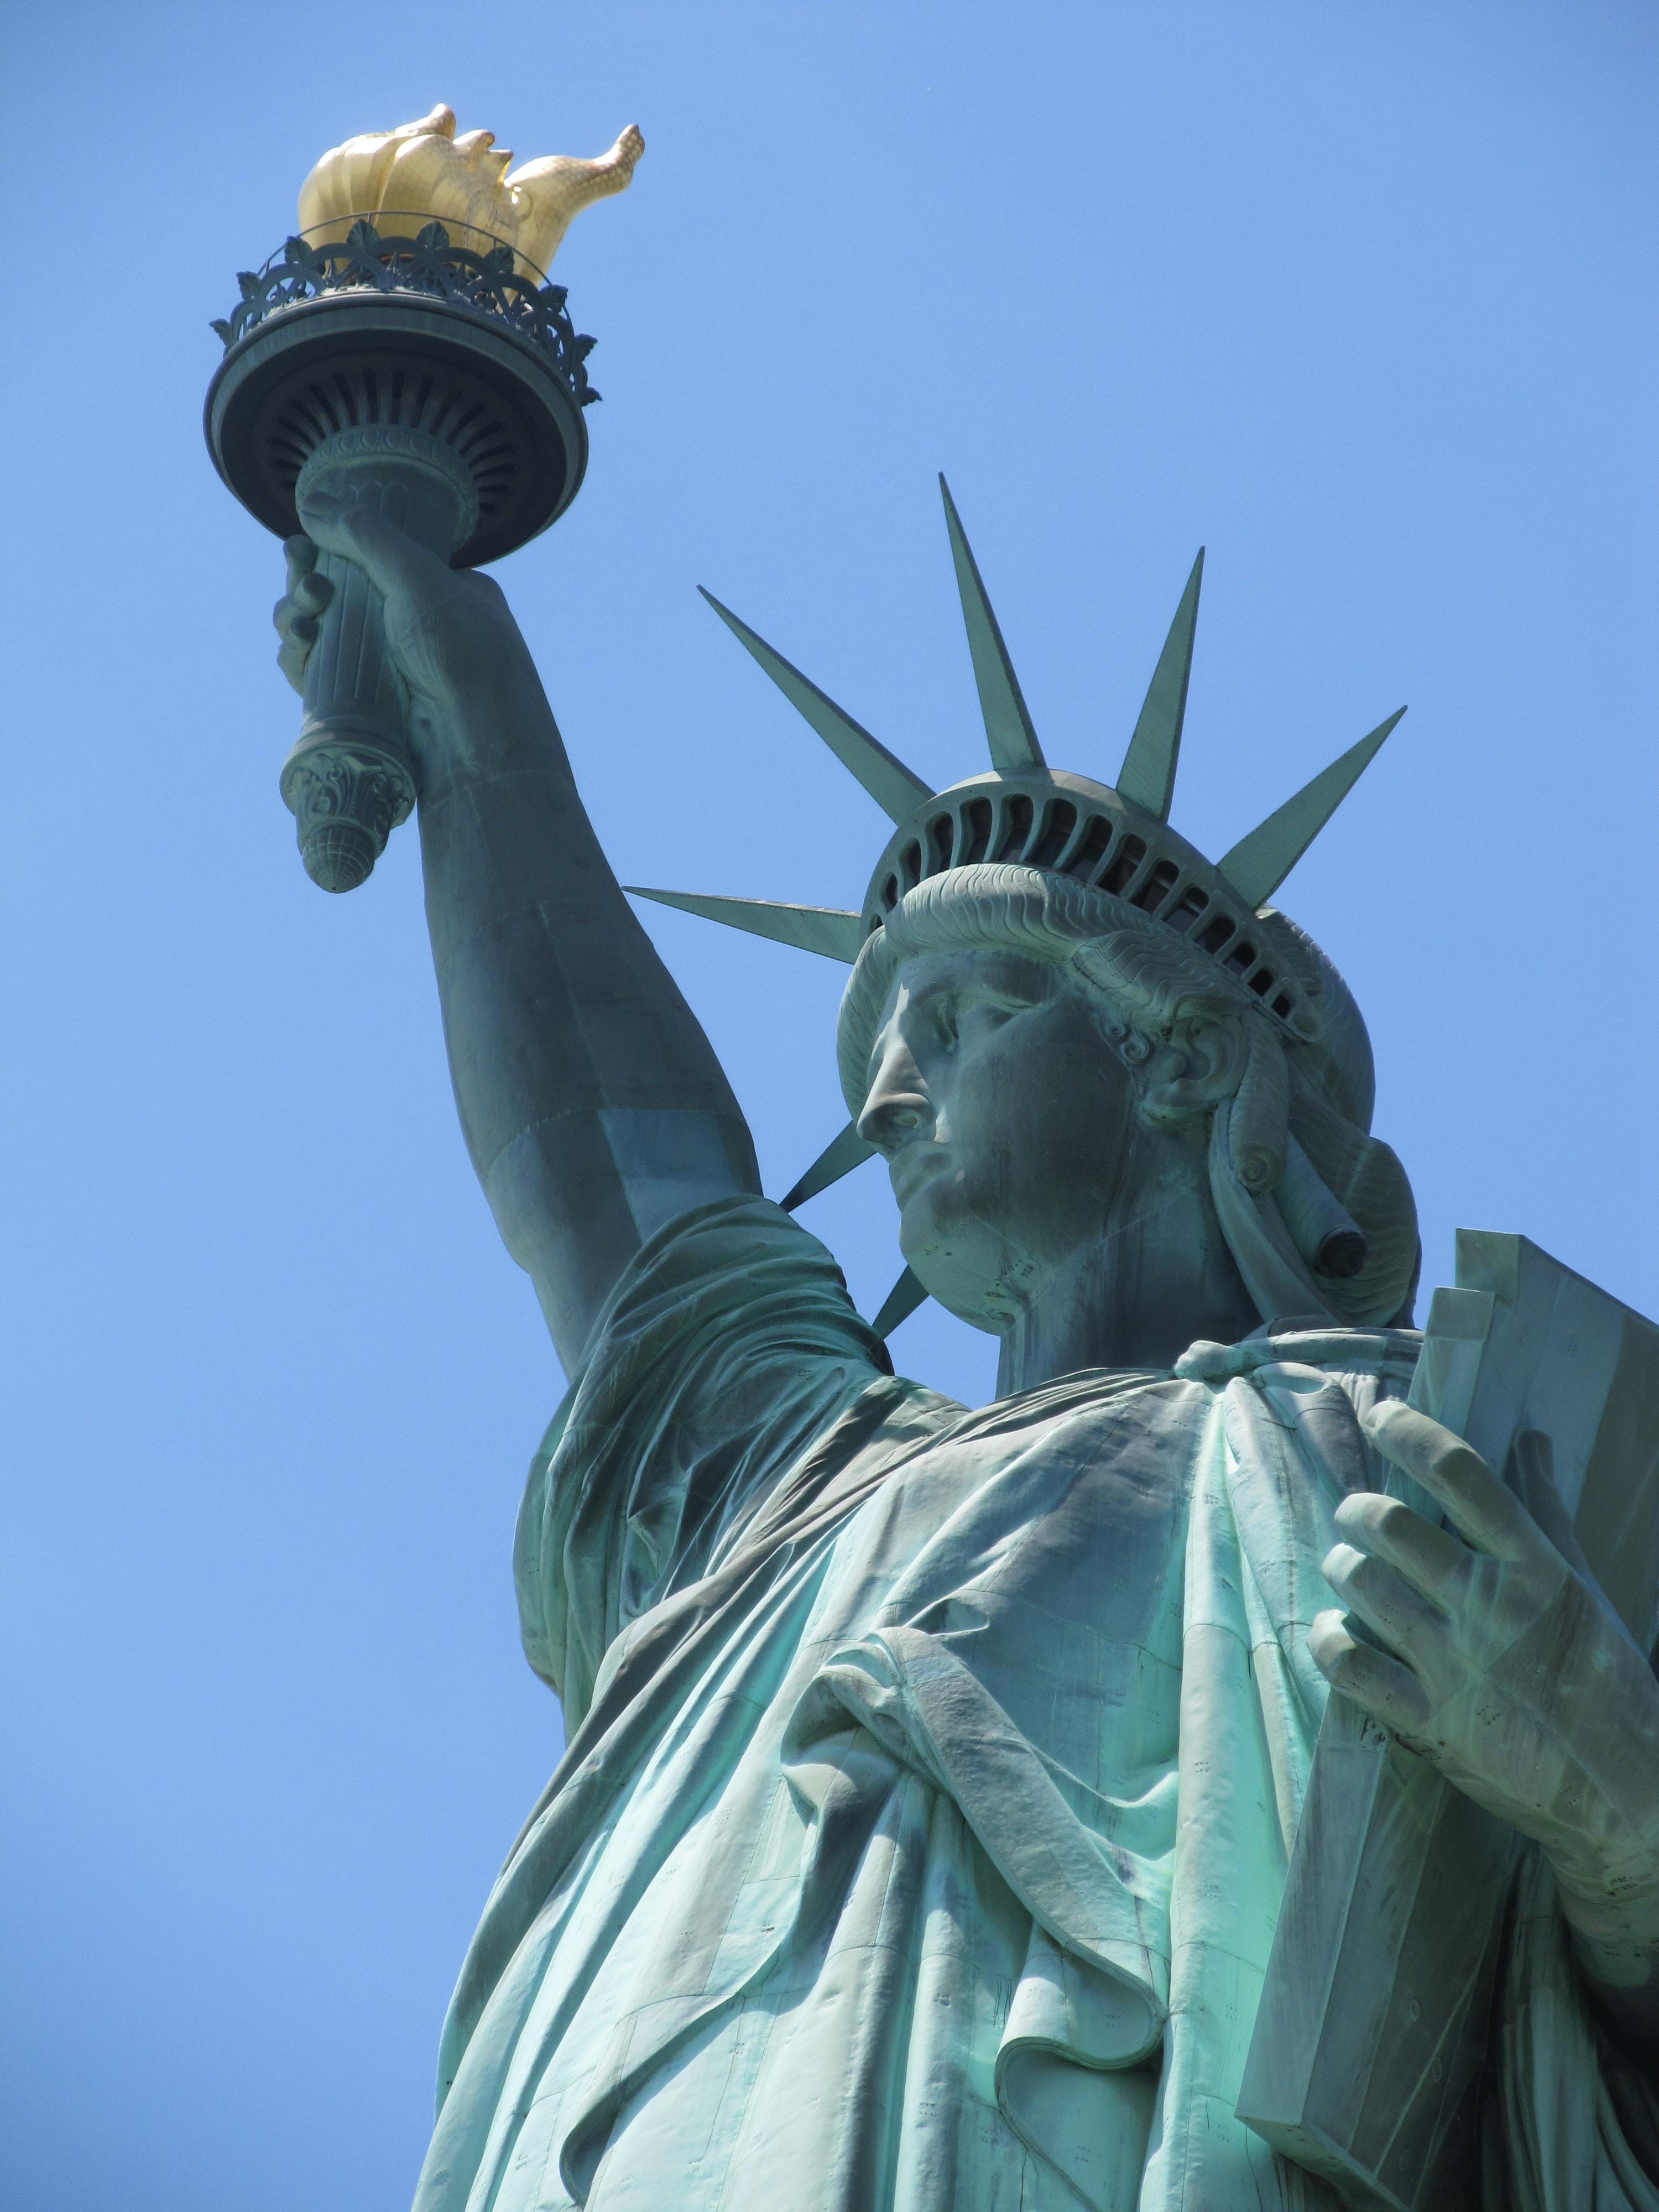 Statue of Liberty, New York under blue sky